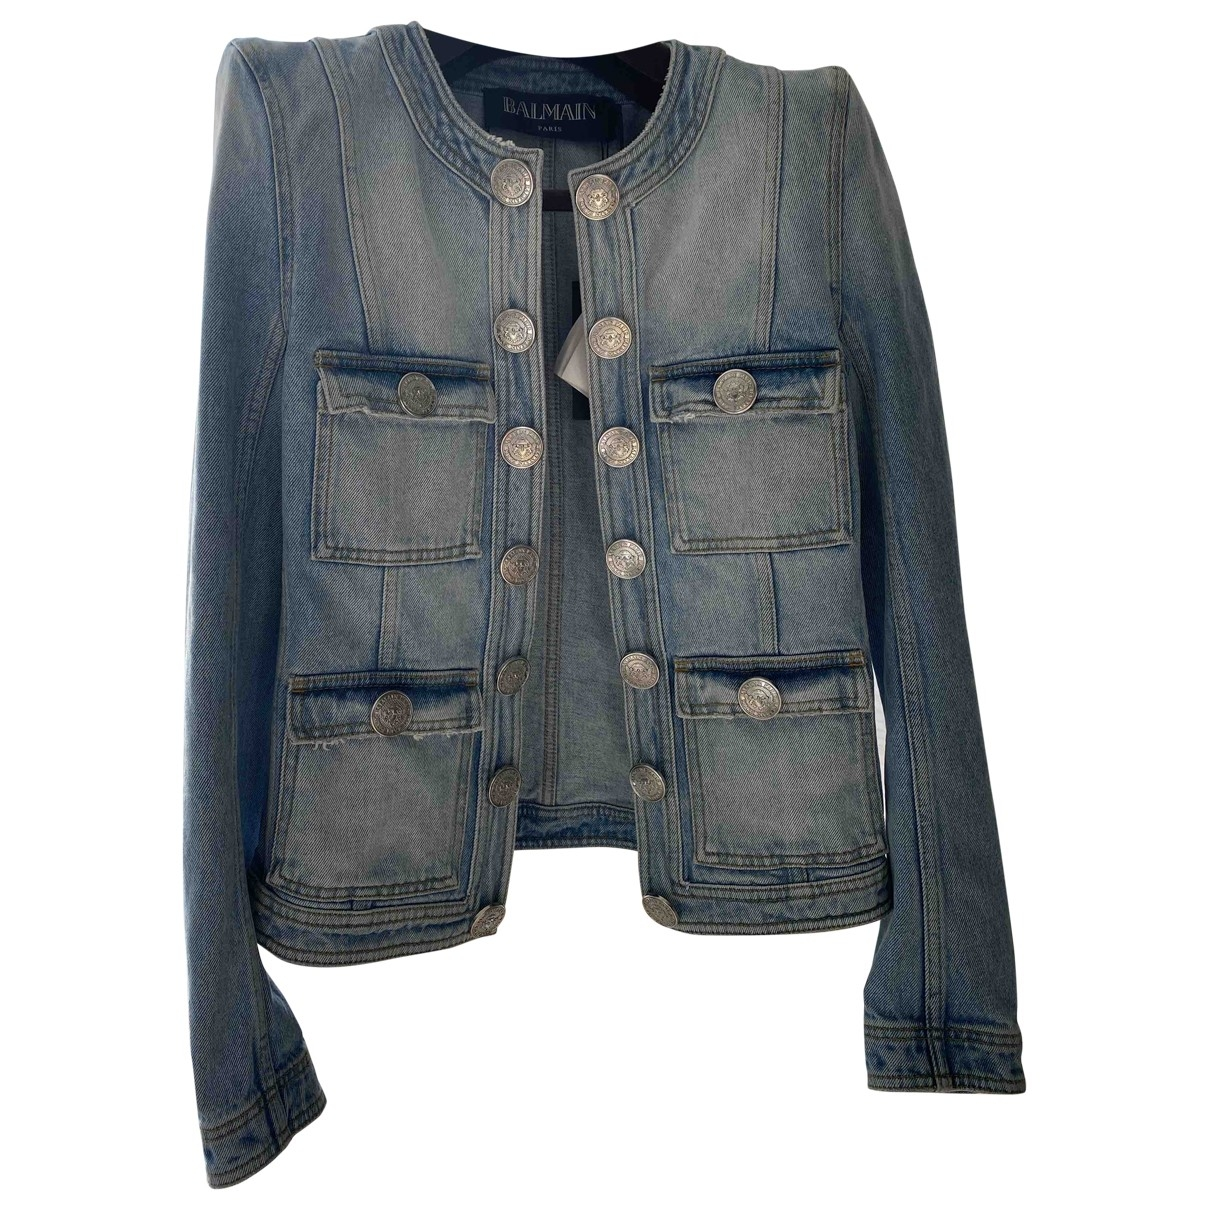 Balmain \N Blue Denim - Jeans jacket for Women 36 FR